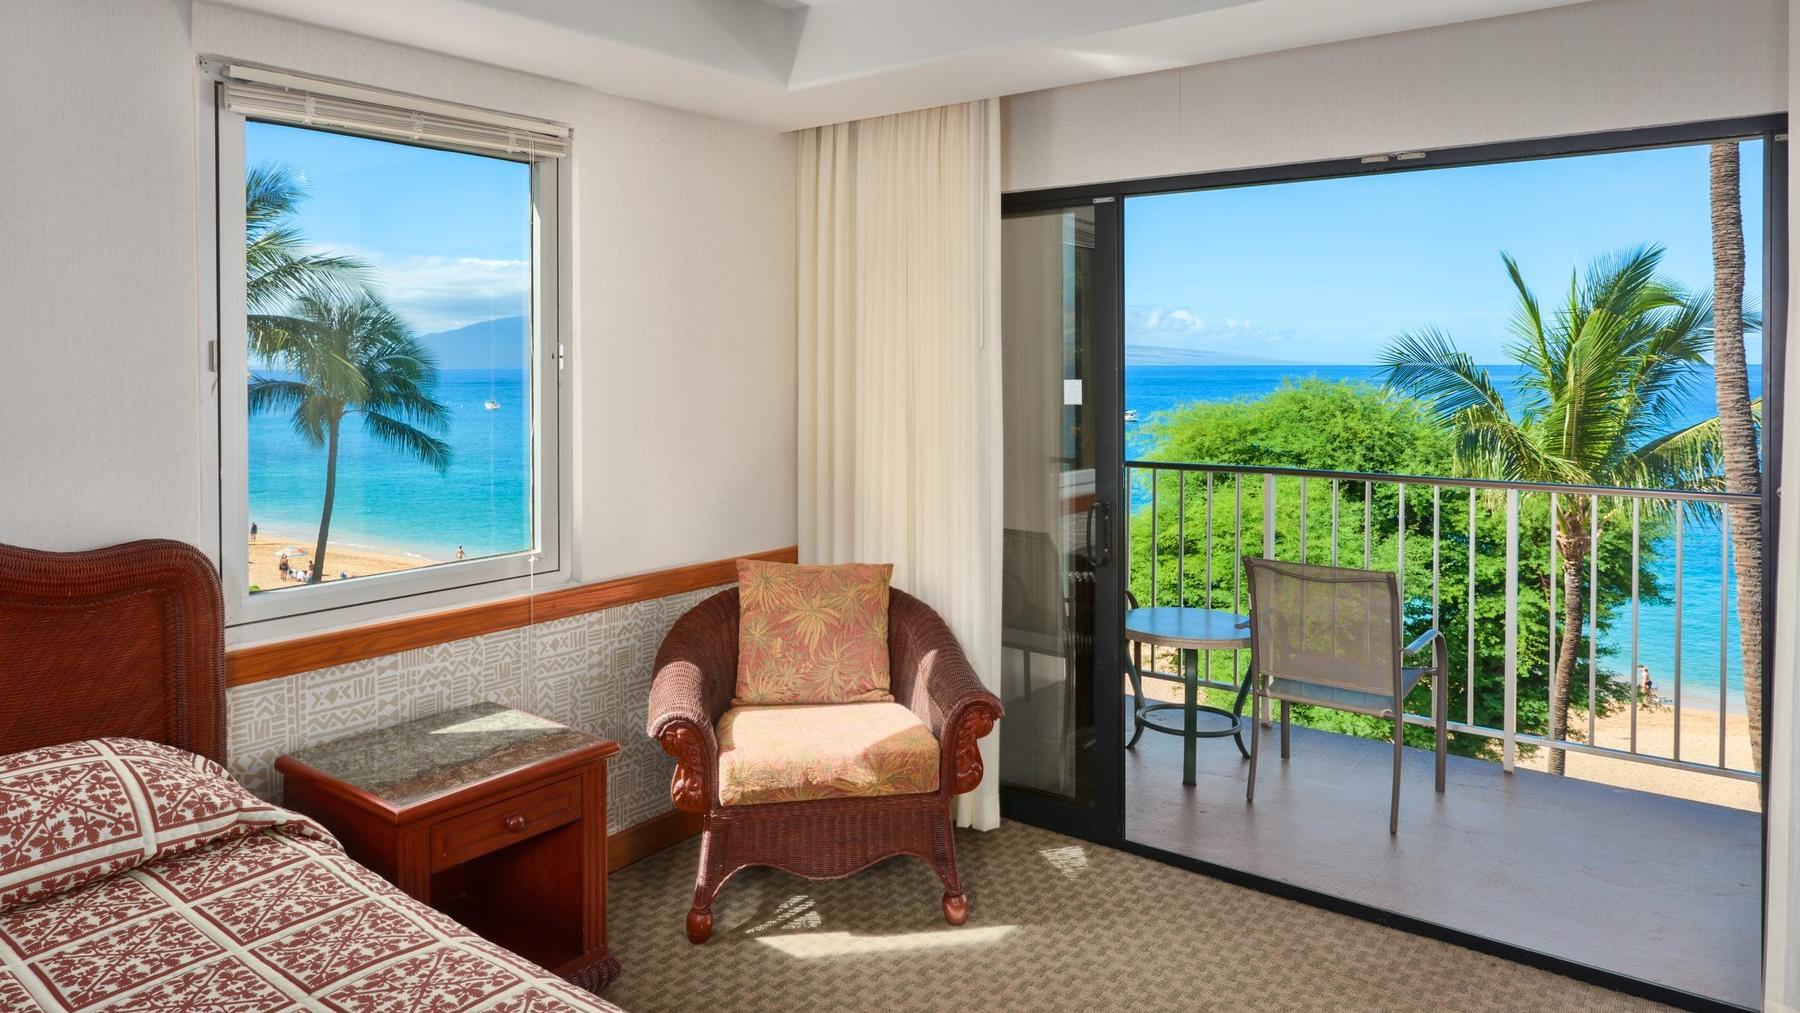 Kaanapali Beach Hotel Ocean Front Room